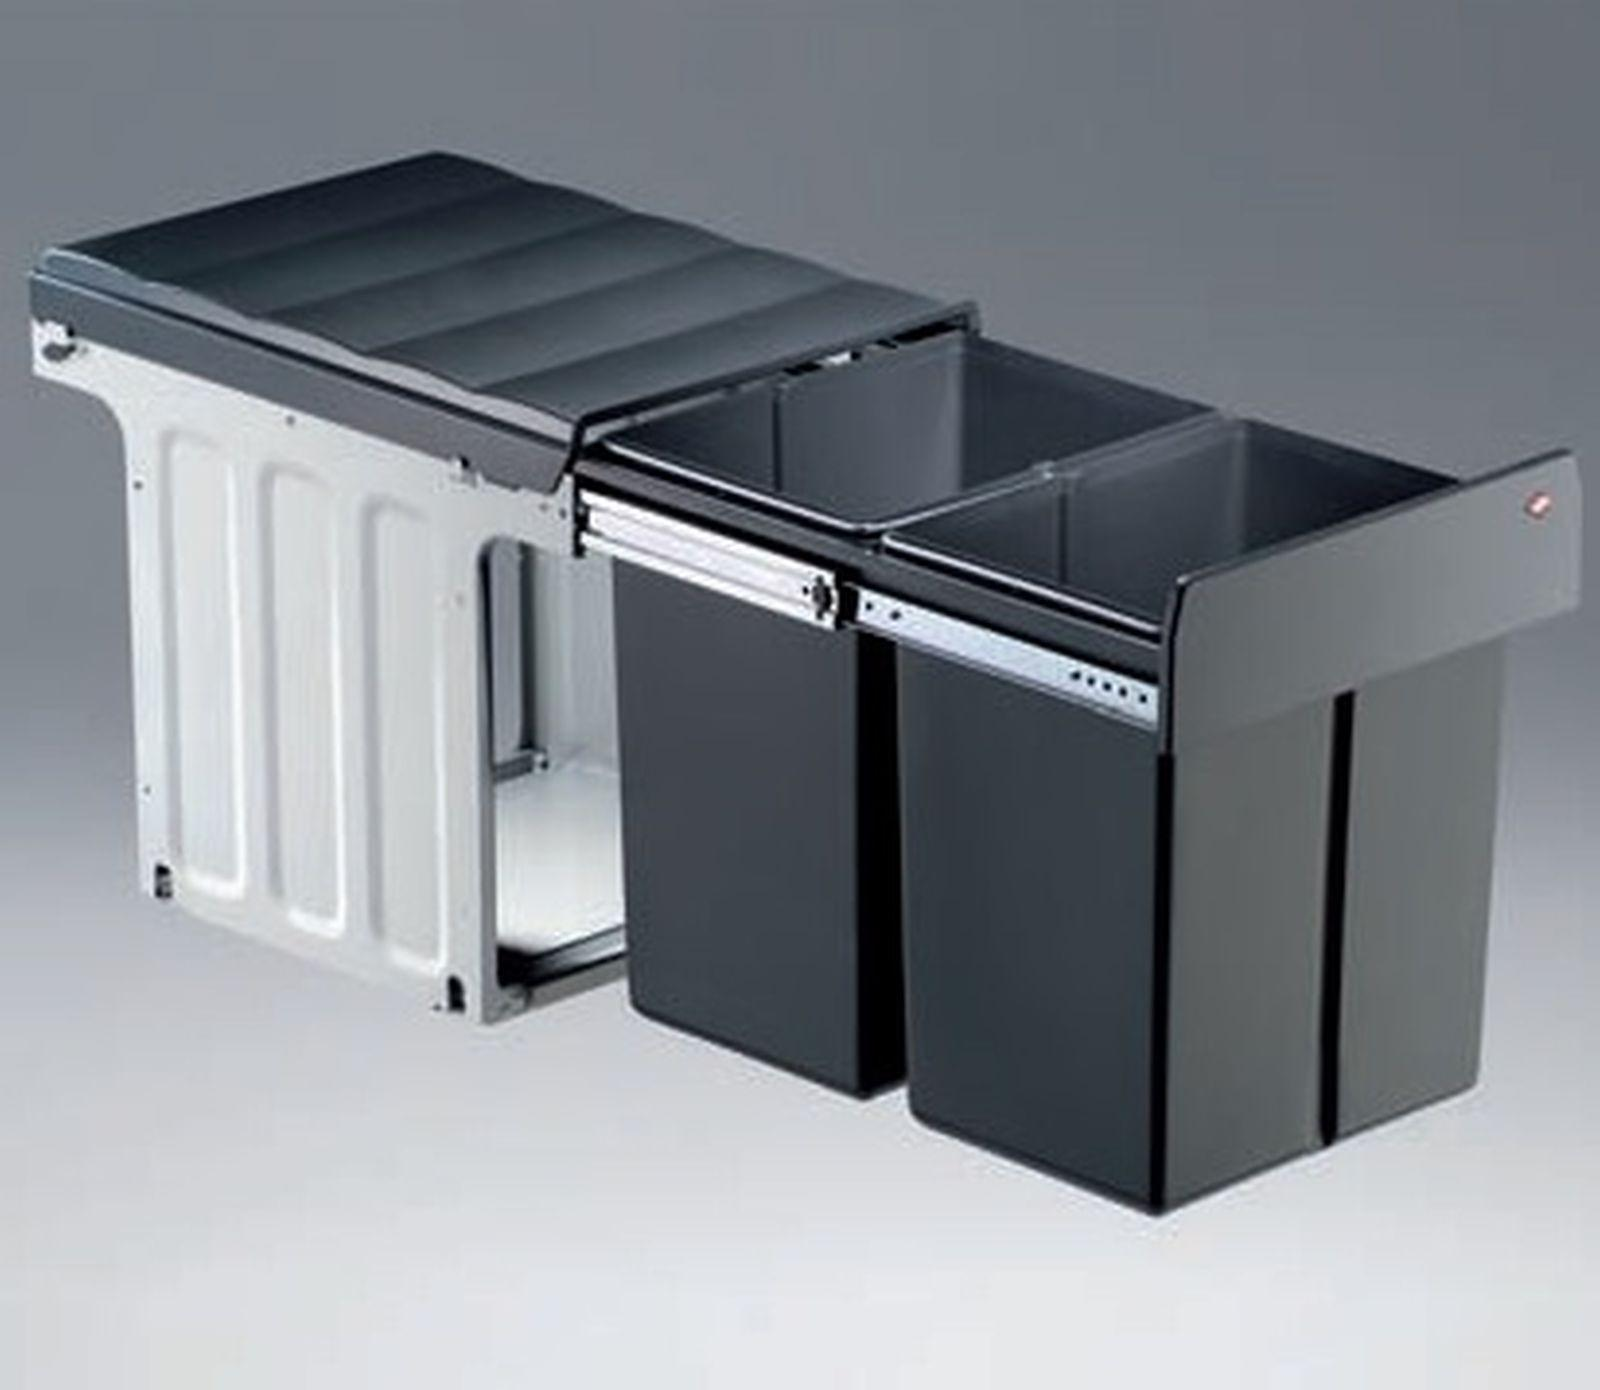 Wesco Double Master 40 Dt Abfallsammler 2 X 16 Liter Kuchen